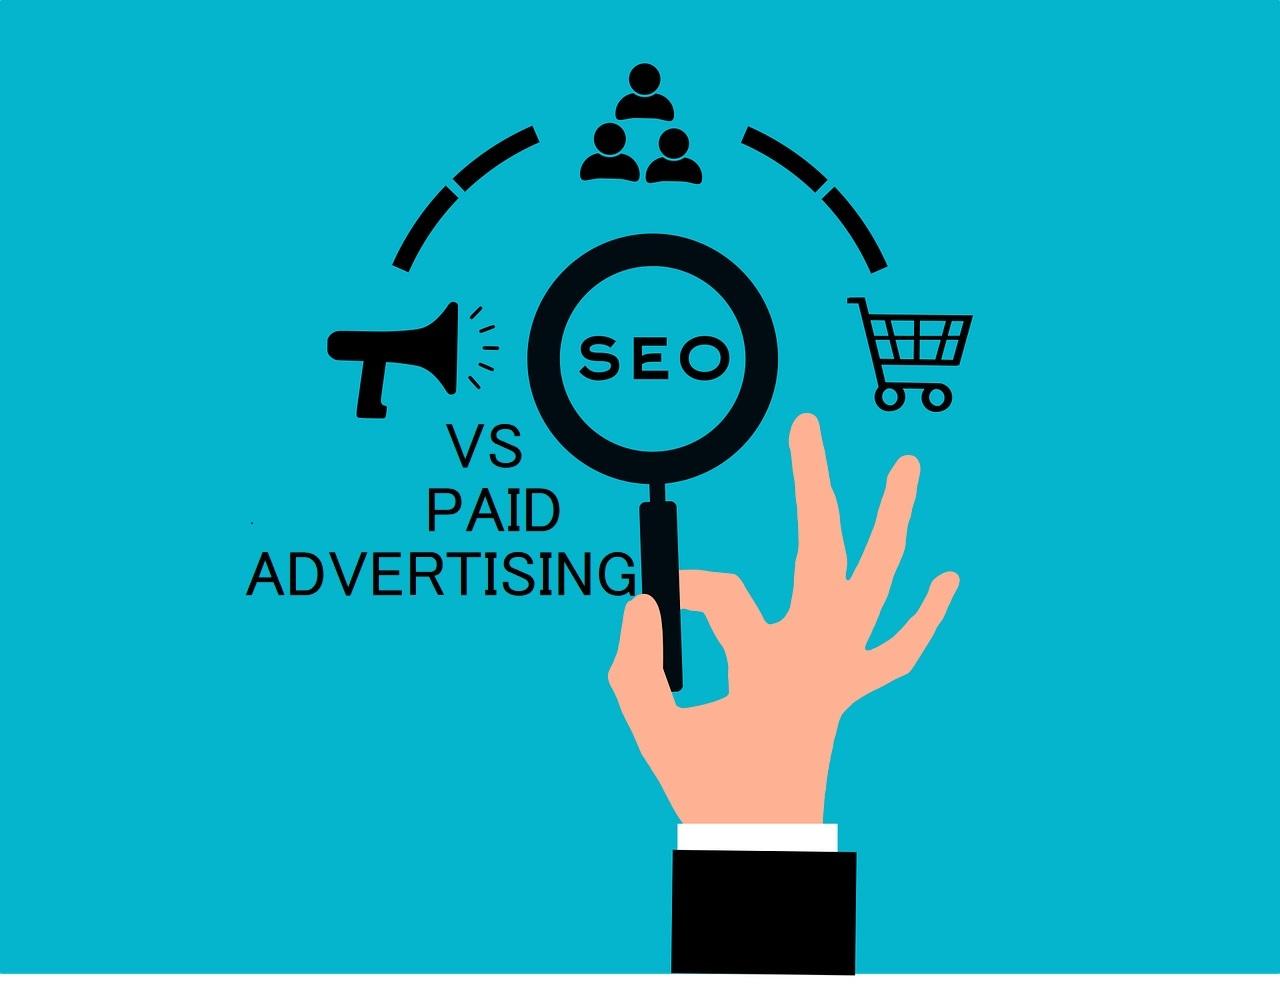 SEO vs Paid Advertising